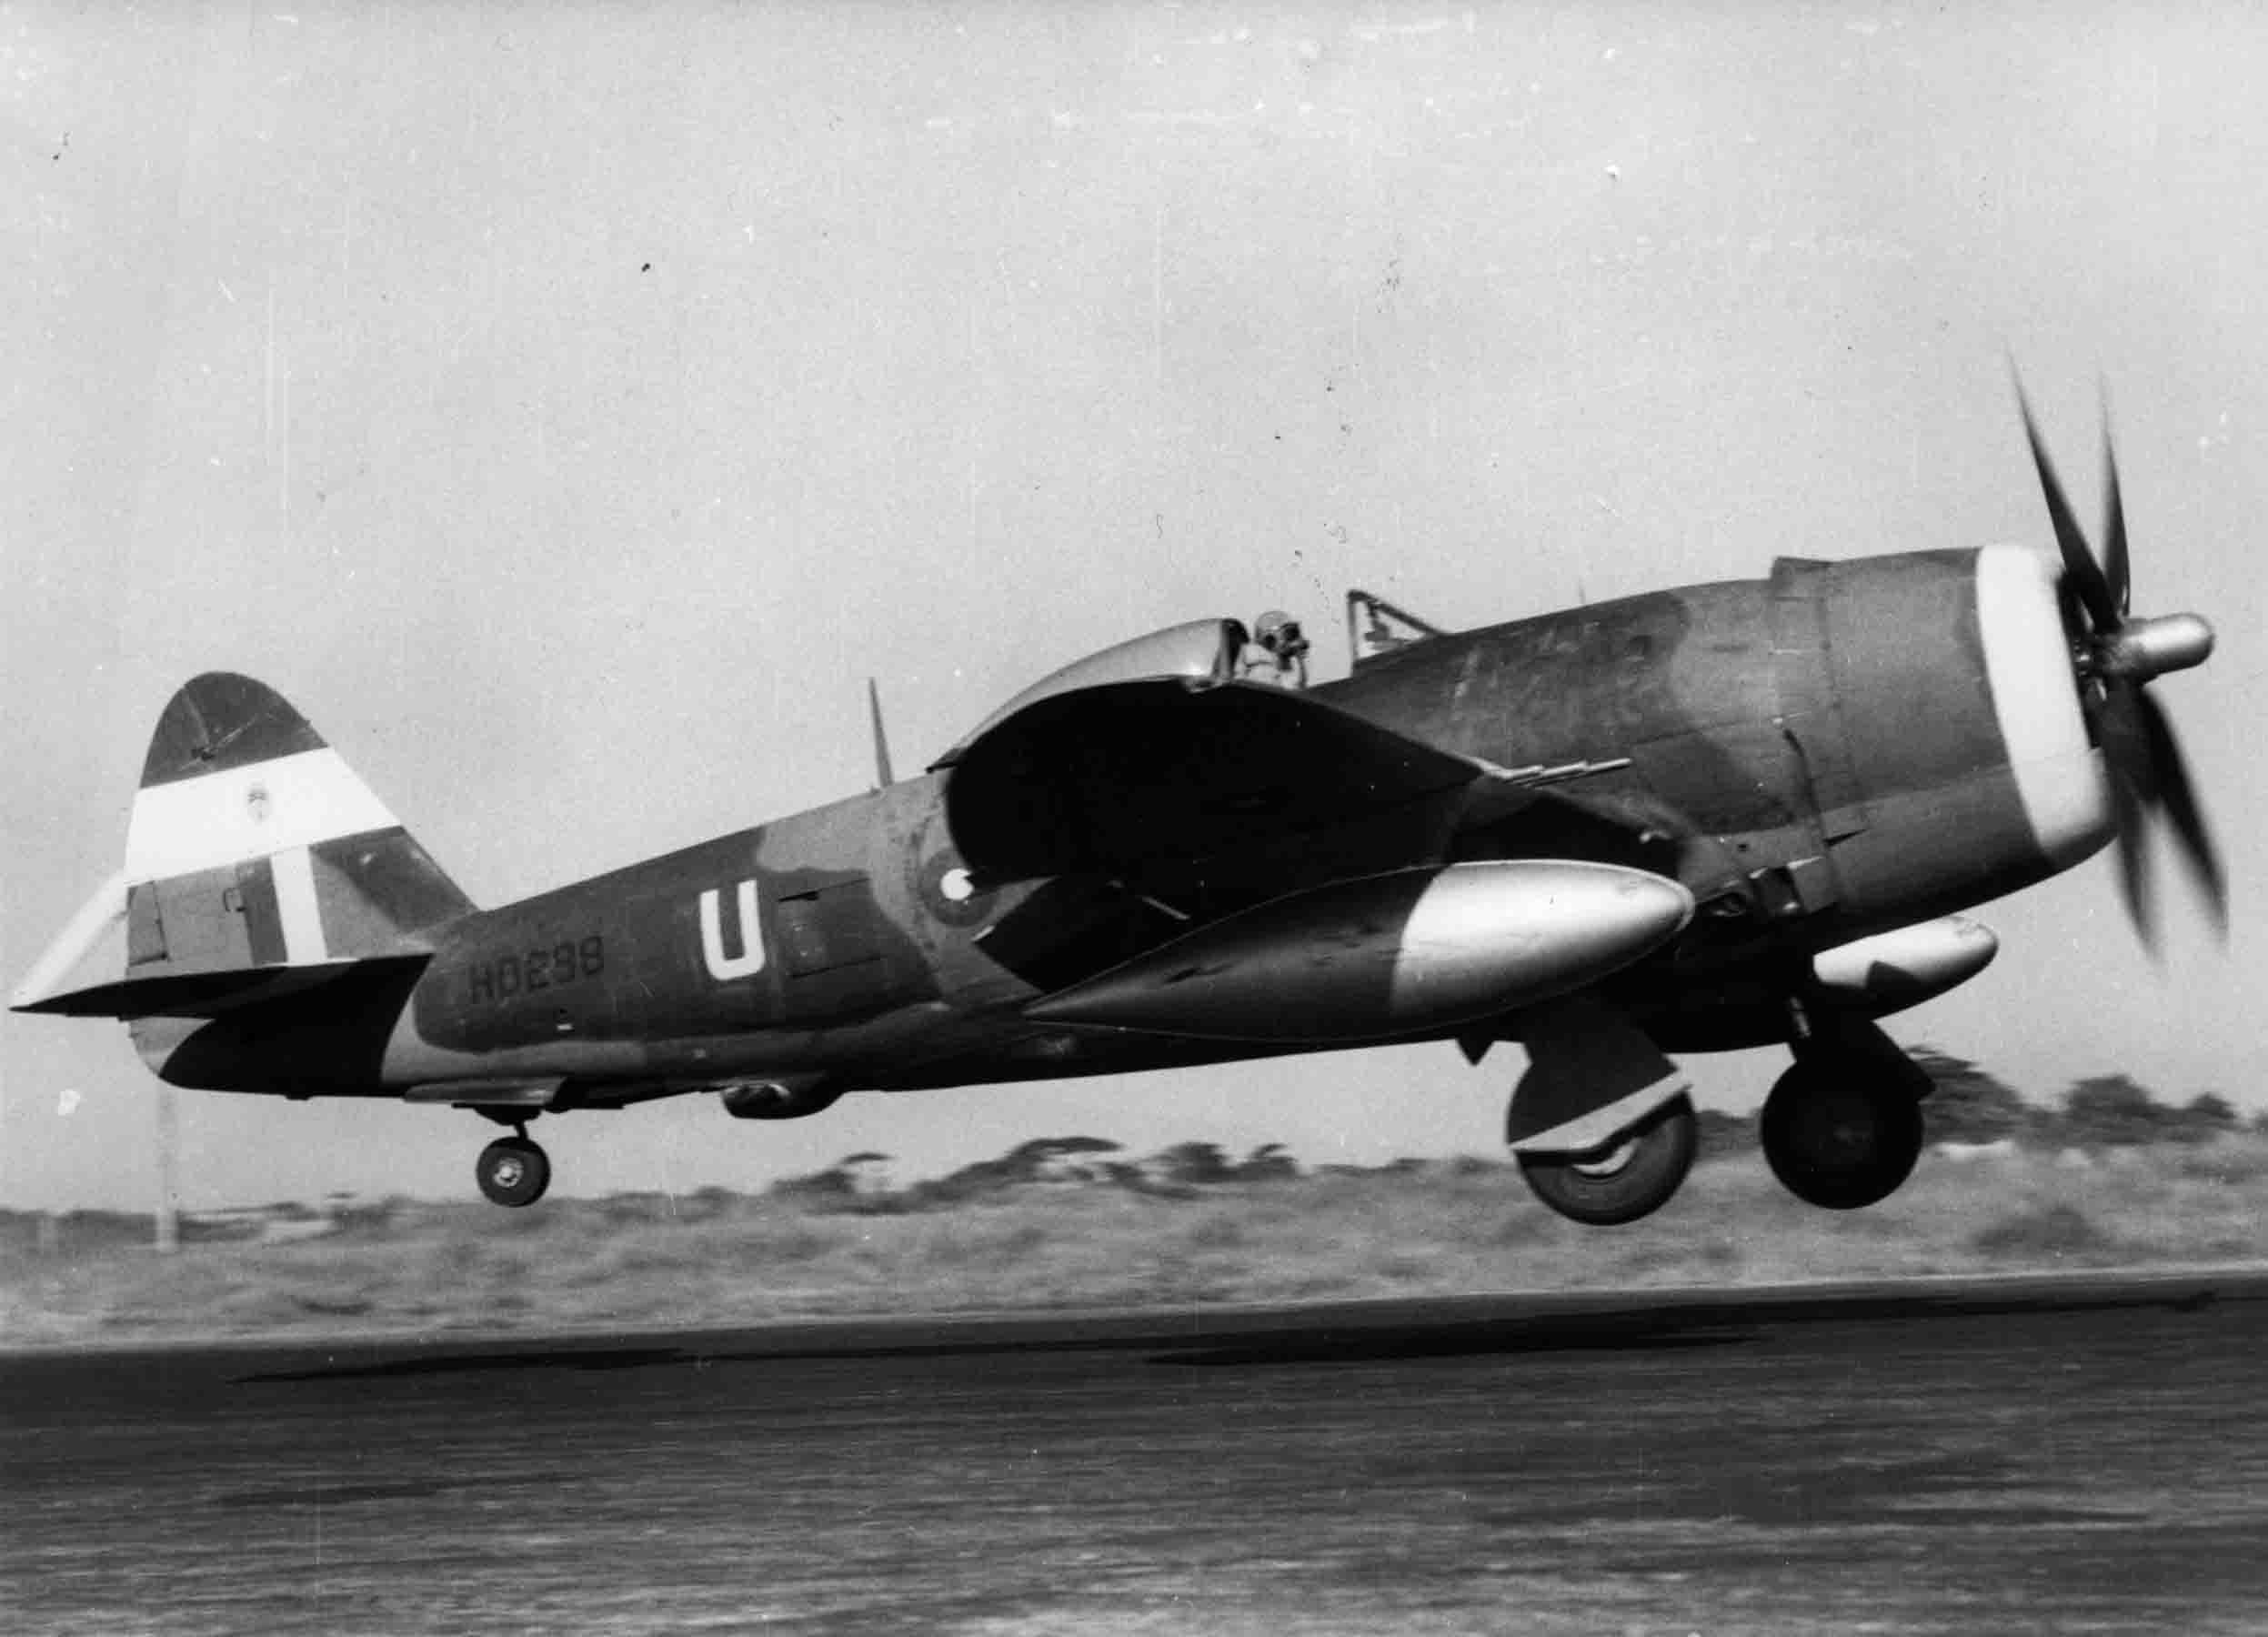 A Republic Thunderbolt Mk.II taking off in the Far East, (RAFM PC73/4/729)